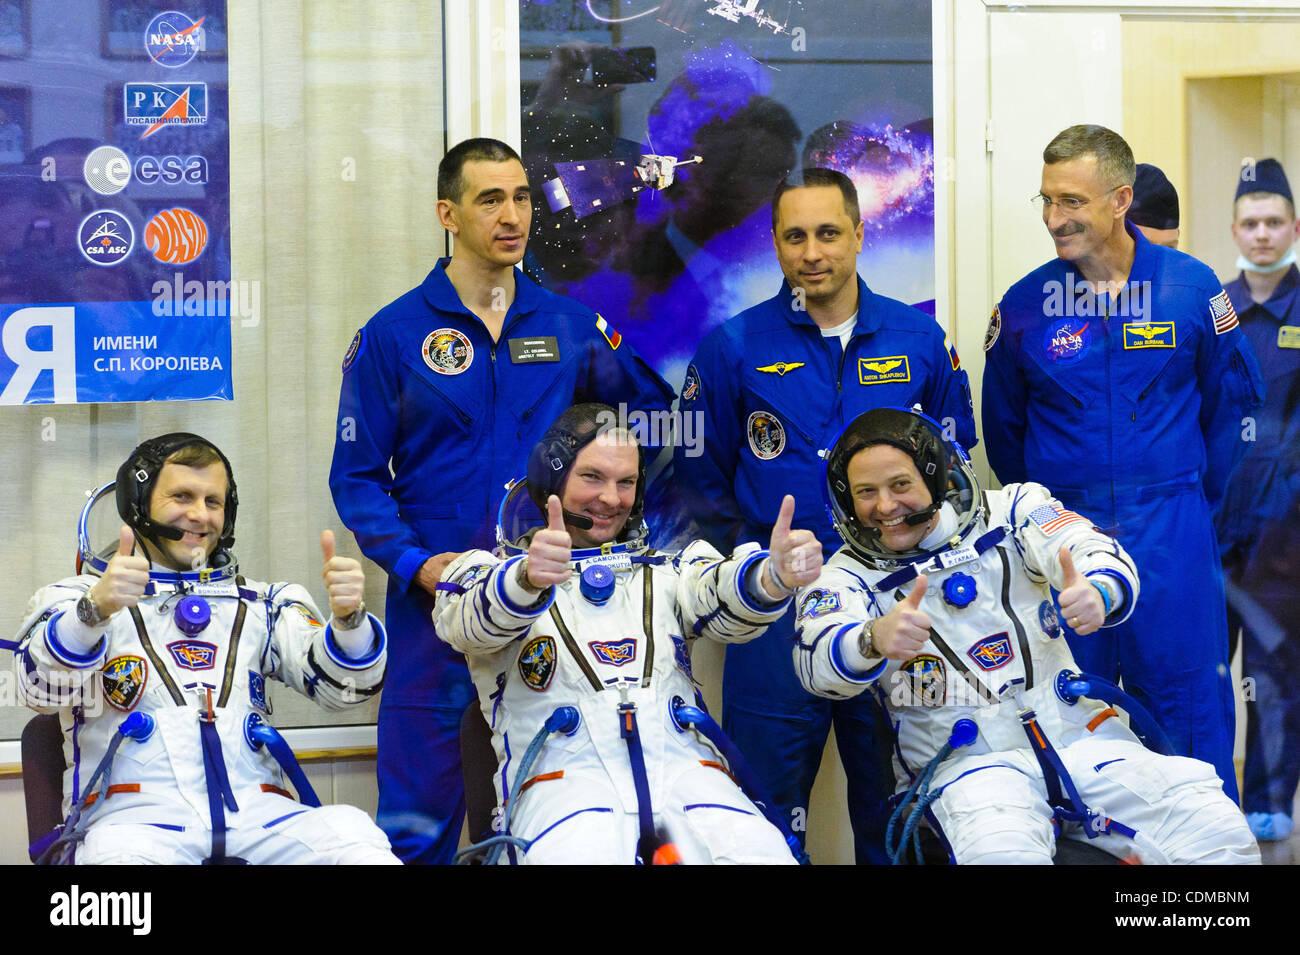 Launch of Russia`s Soyuz TMA-21 spacecraft at Baikonur Cosmodrome in Kazakhstan.Pictured: Crew of the Soyuz TMA - Stock Image